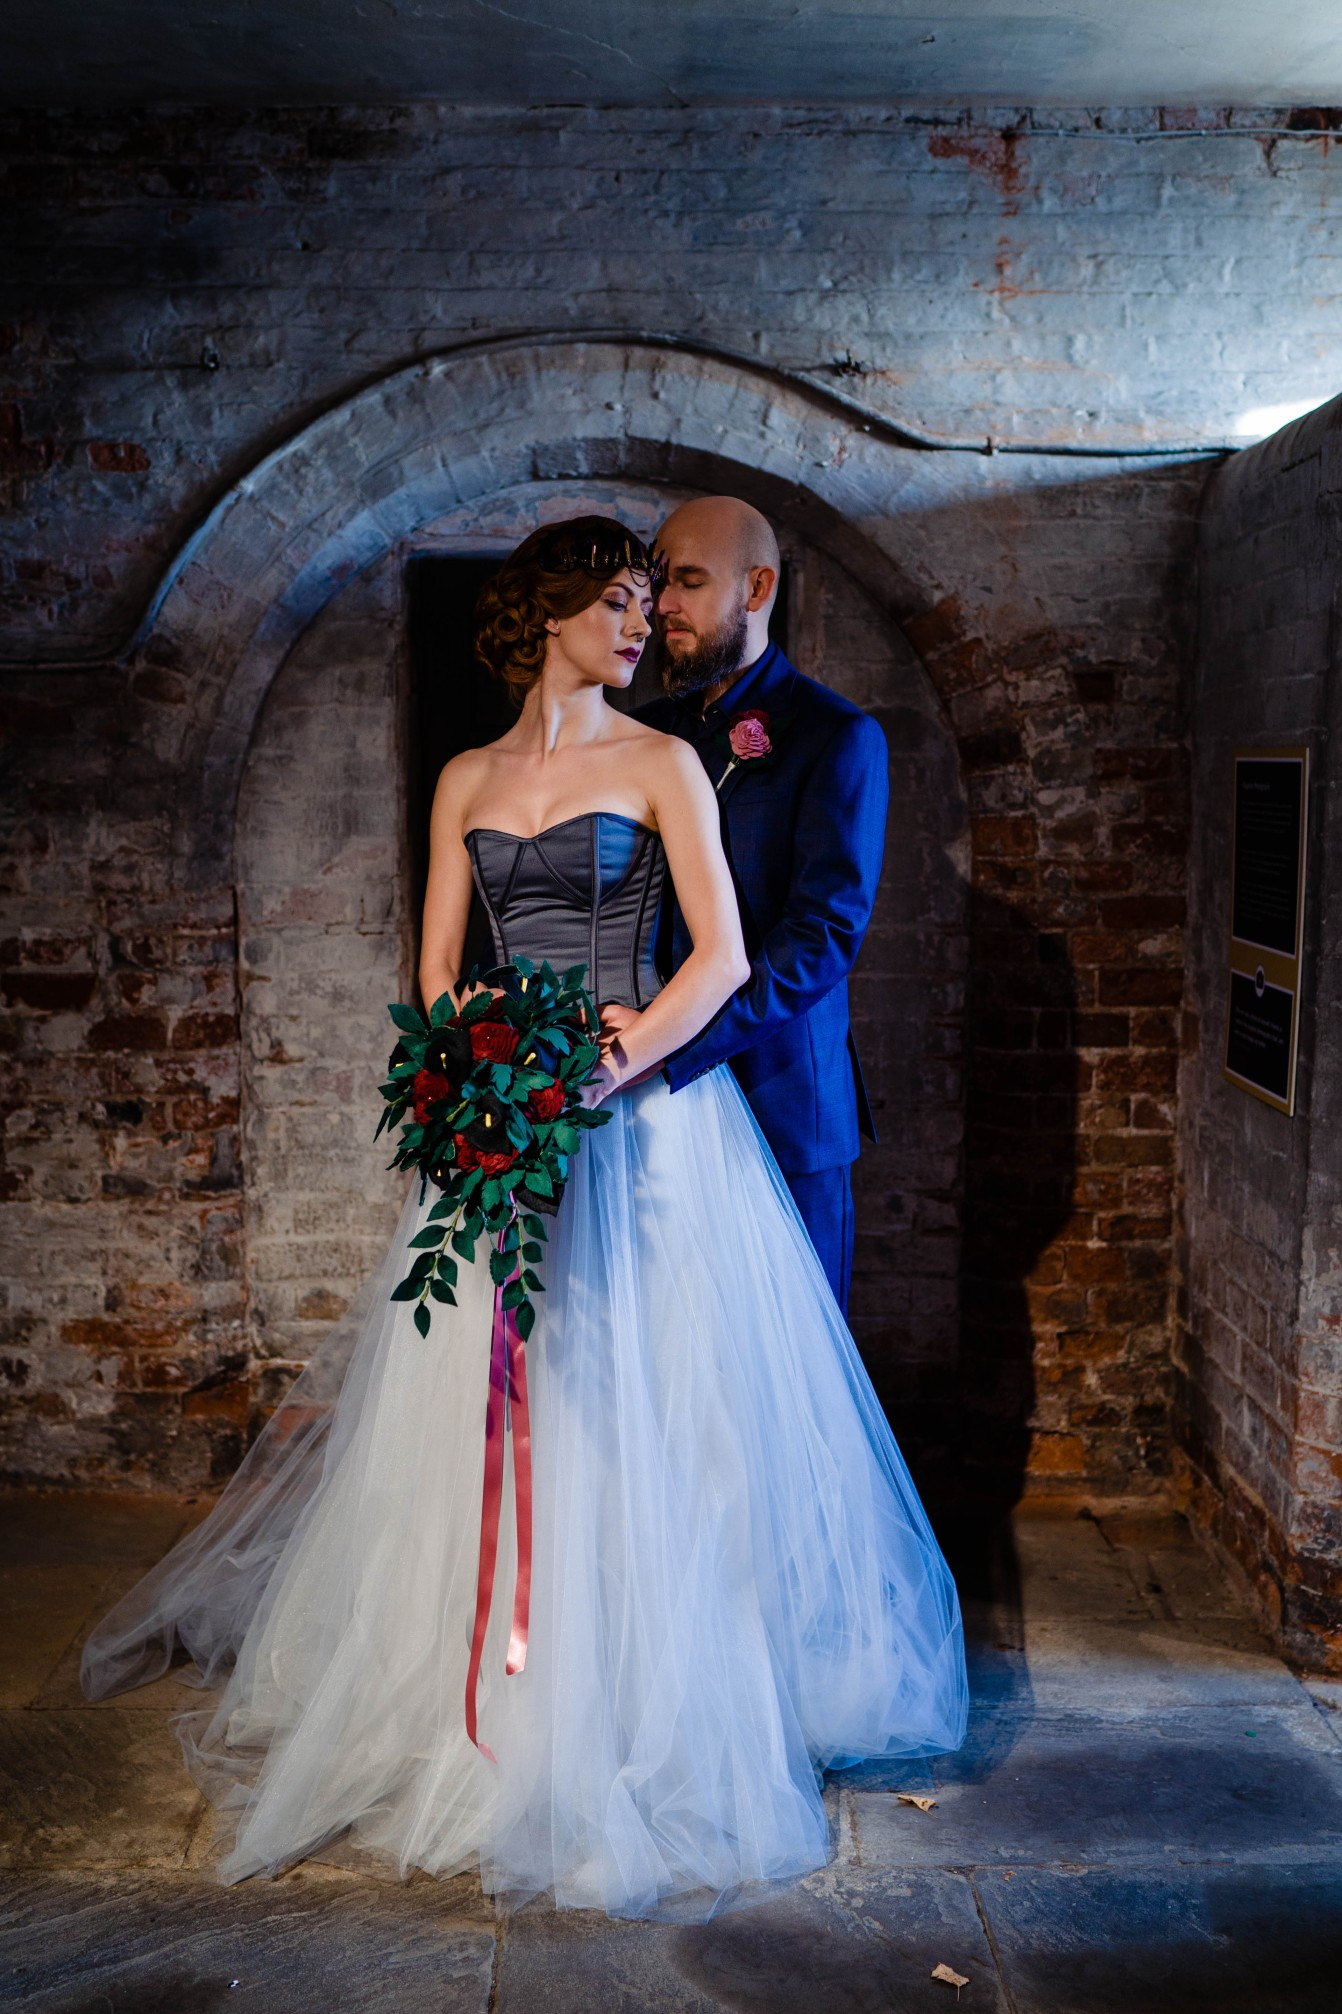 A gothic wedding - national justice museum wedding - alternative wedding - Vicki Clayson Photography (1)